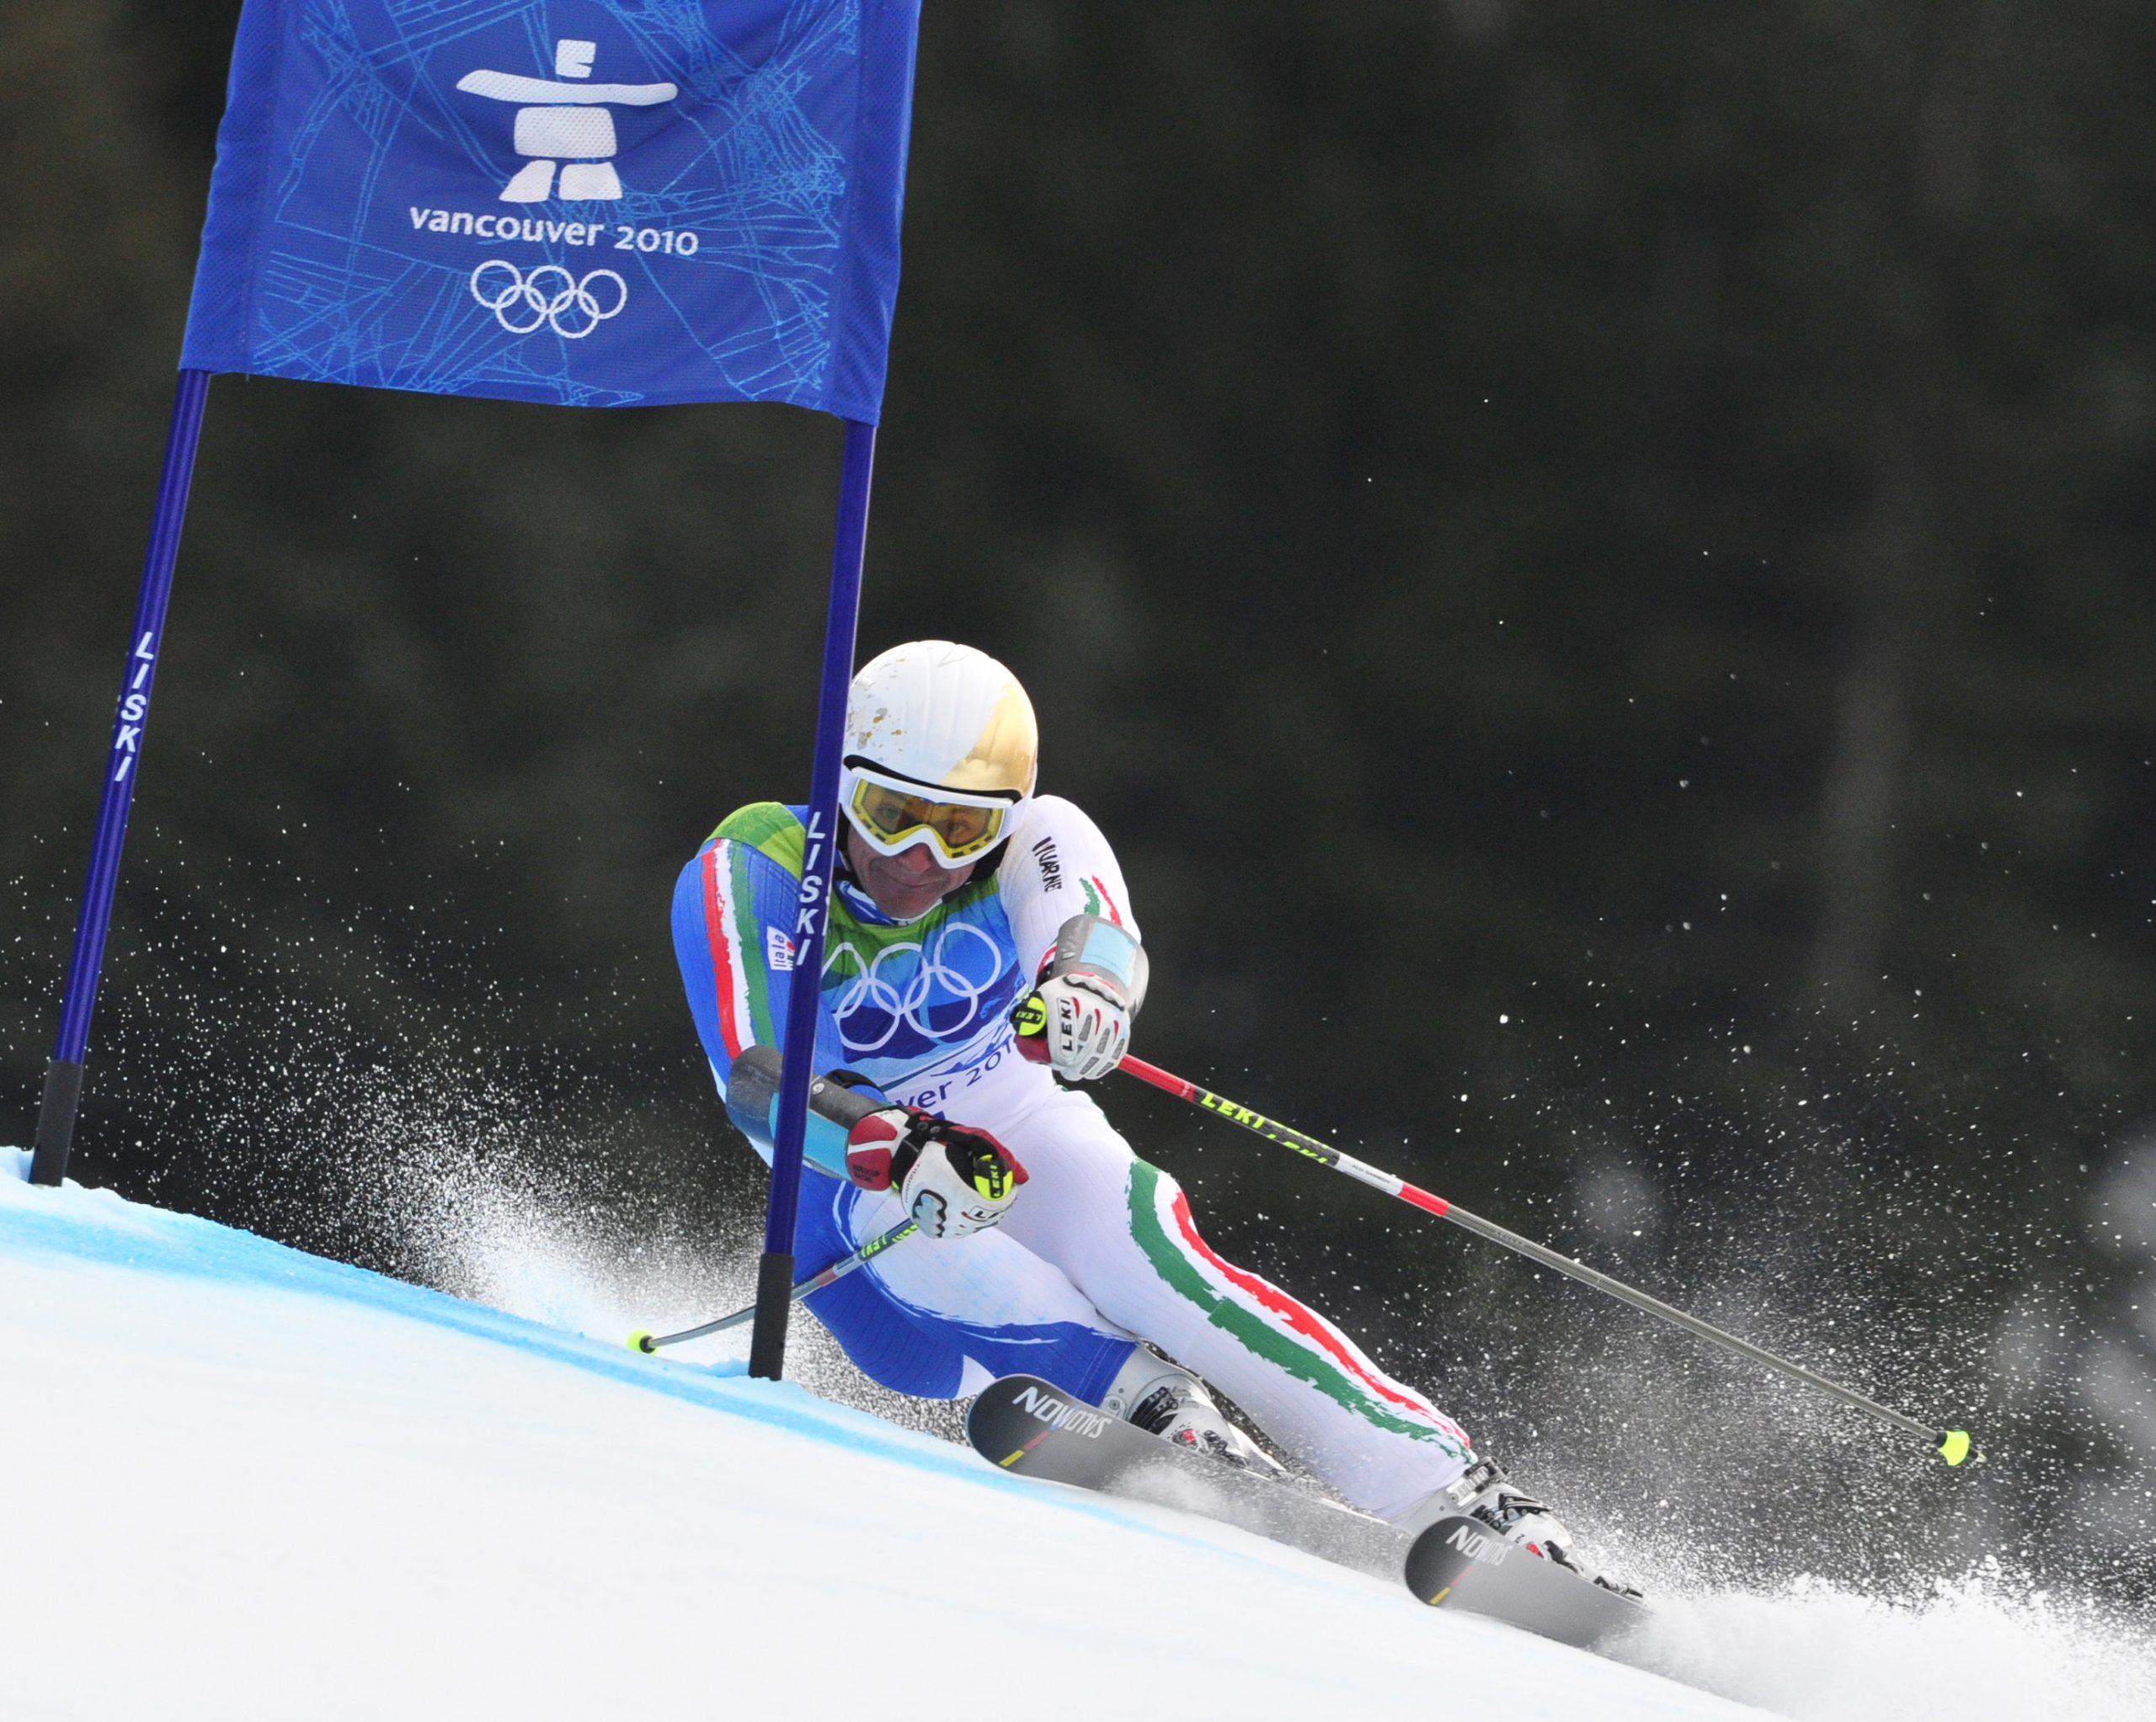 Olimpiadi Vancouver 2010